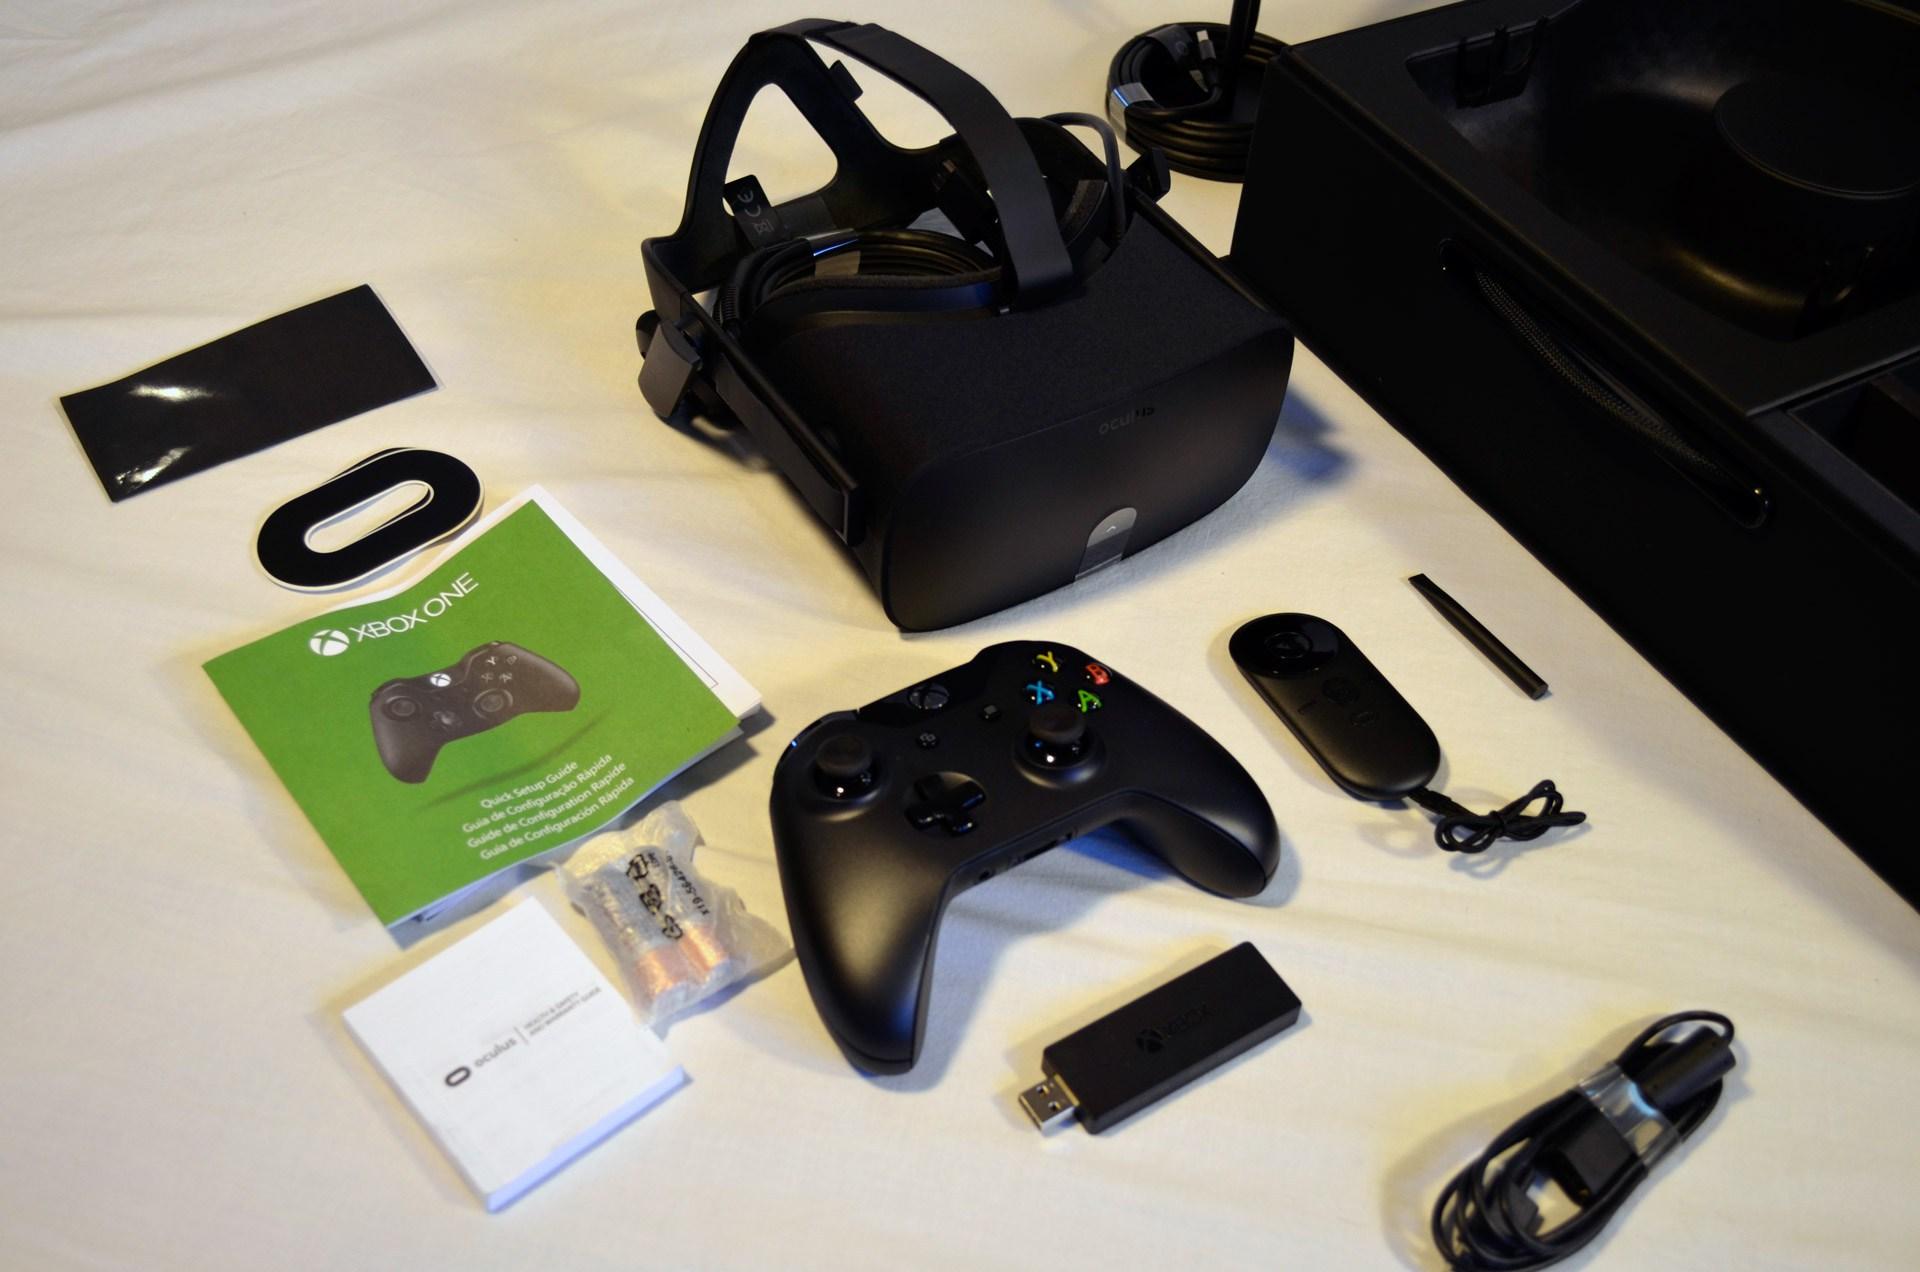 oculus-rift-cv1-unboxing-38.jpg